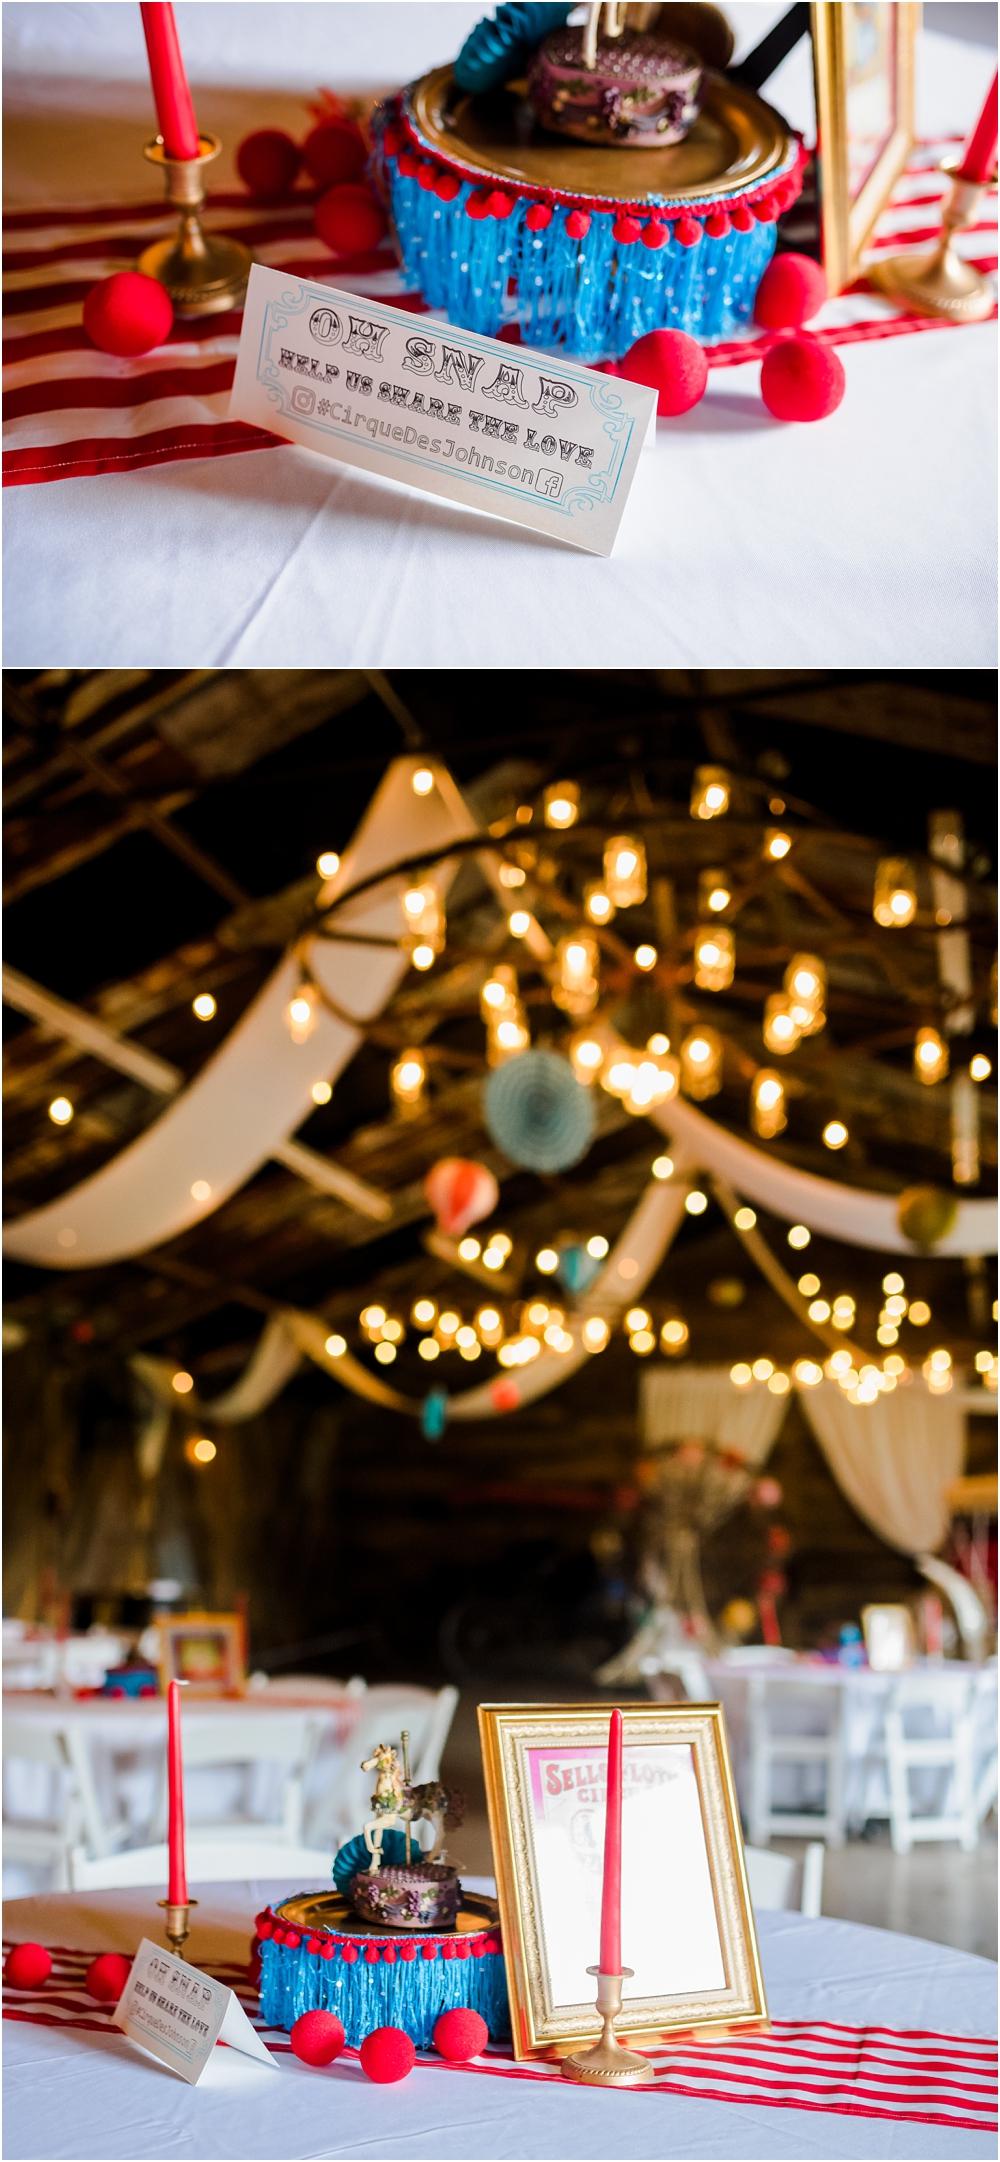 the-barn-at-wateroaks-circus-florida-wedding-photographer-kiersten-stevenson-photography-23.jpg